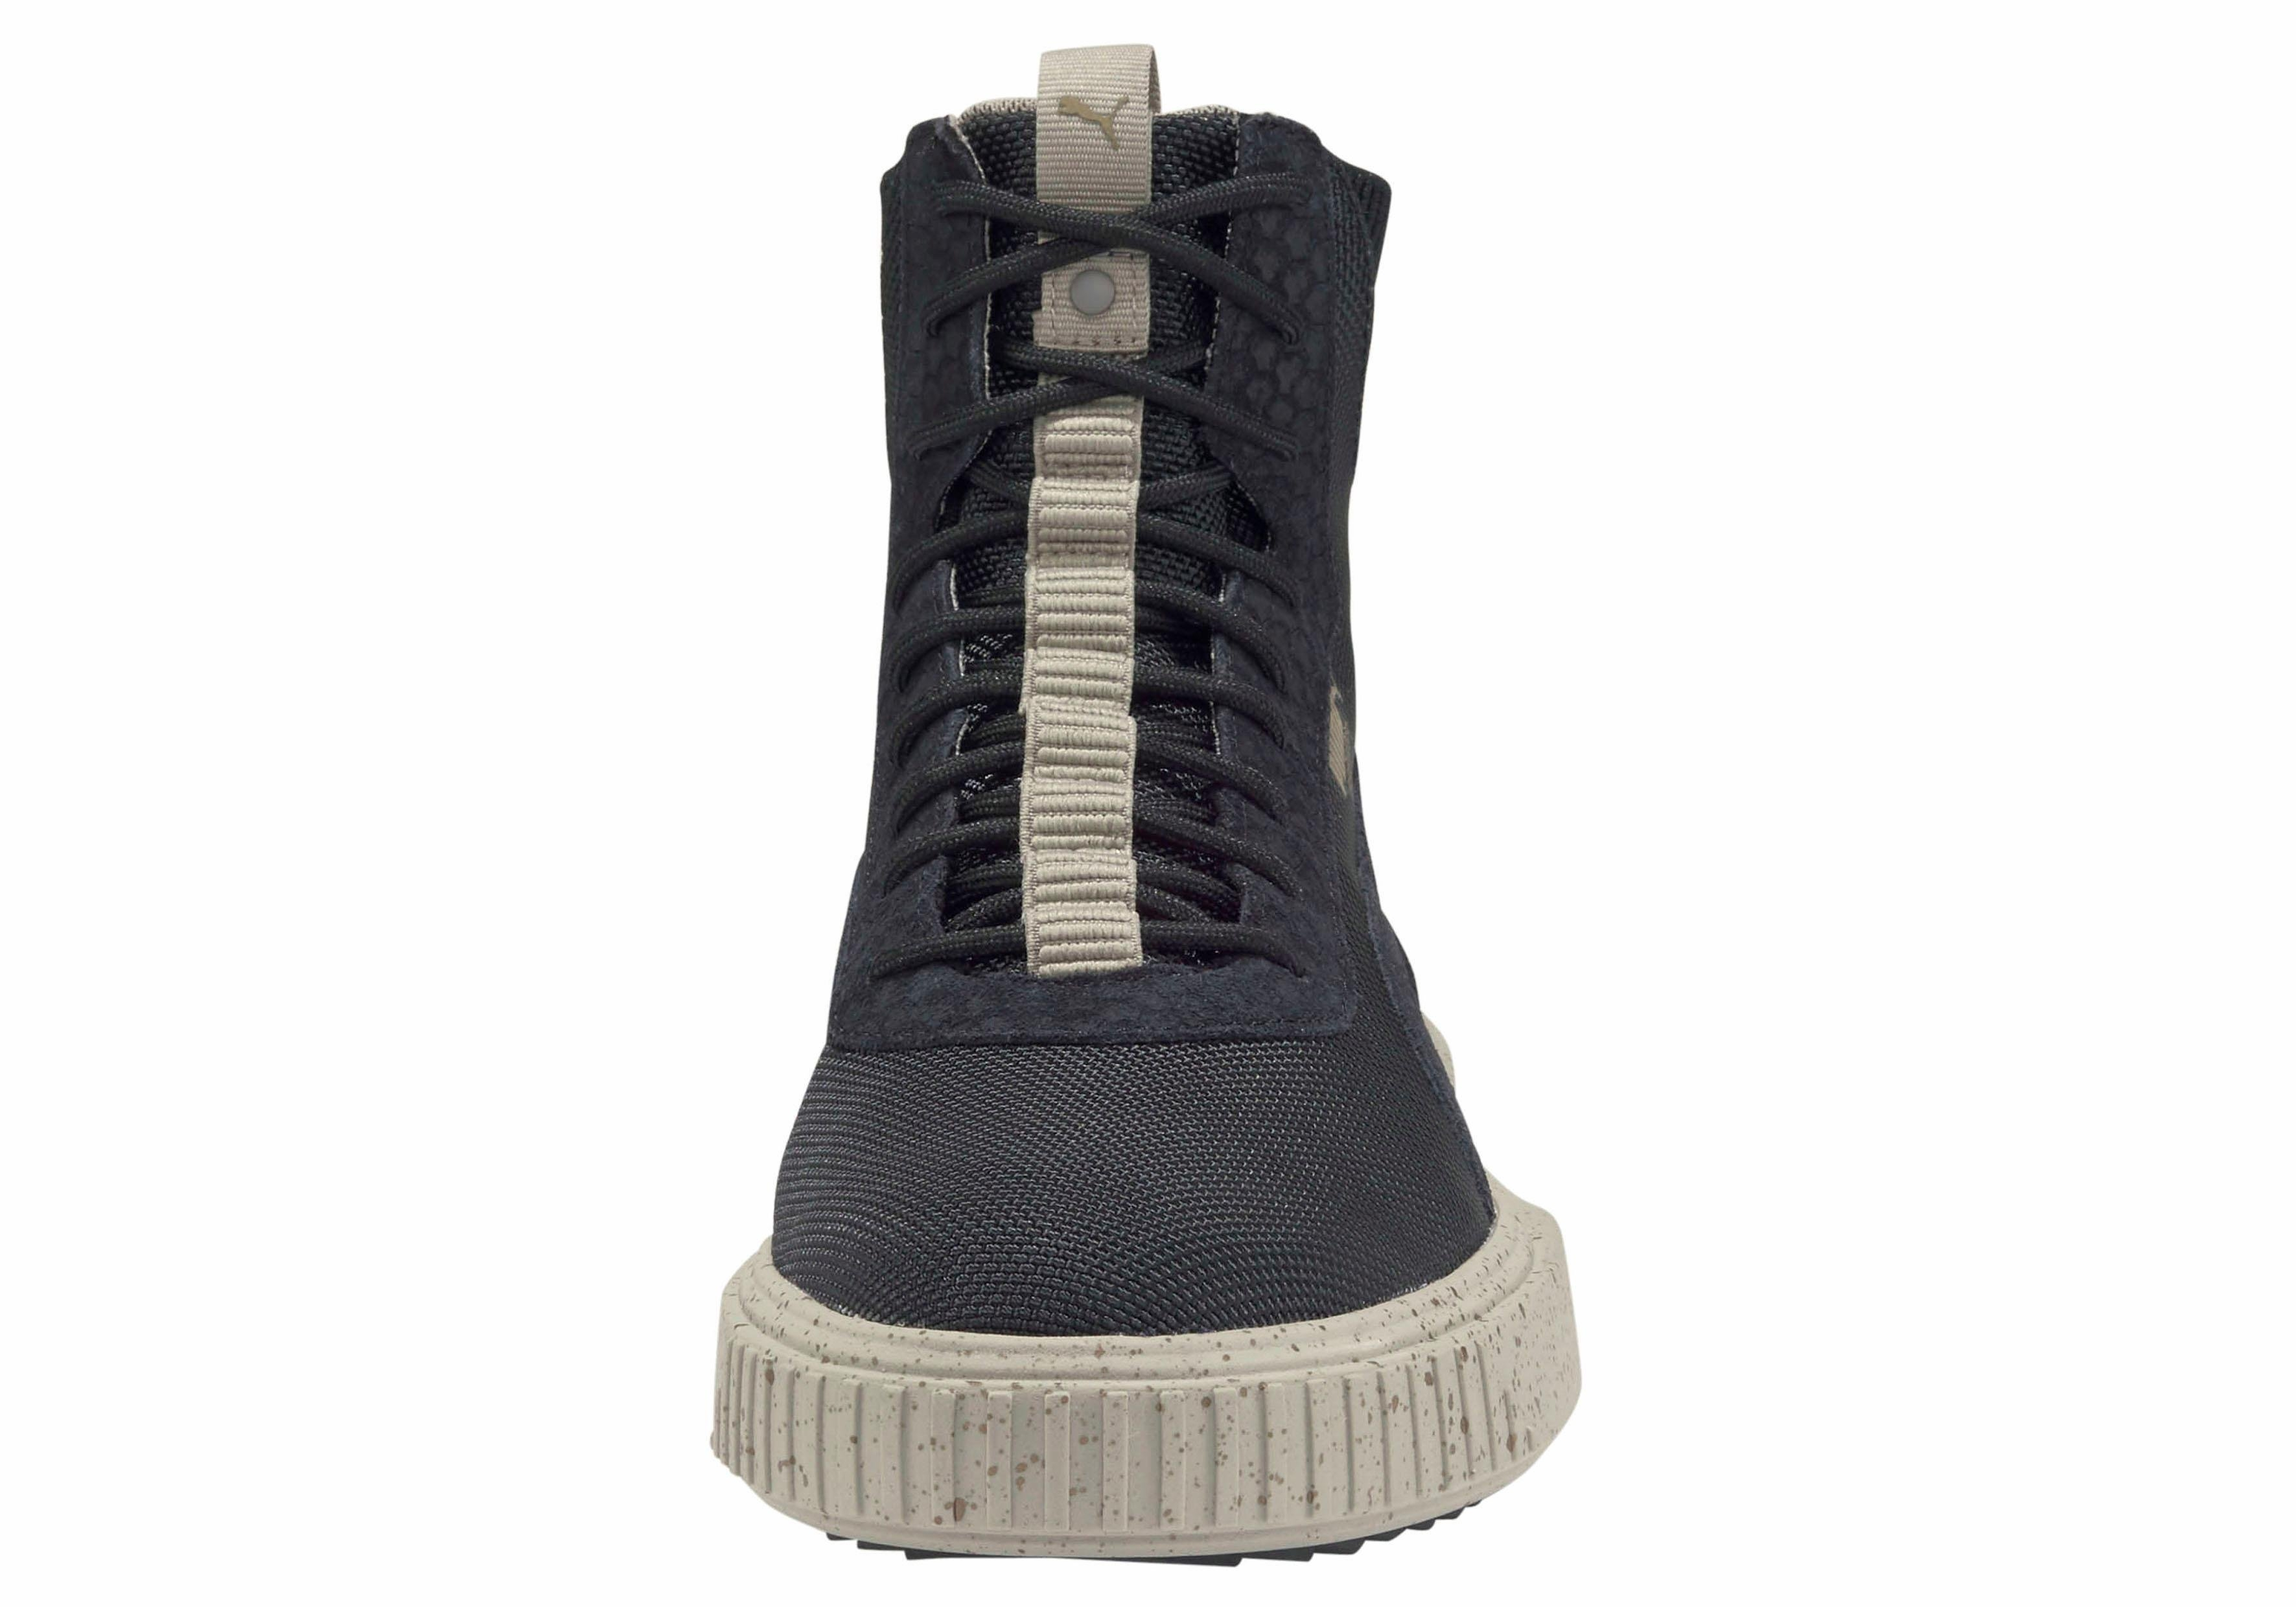 Sneakersbreaker Makkelijk Gekocht Hi Blocked Puma DWb29YeEHI